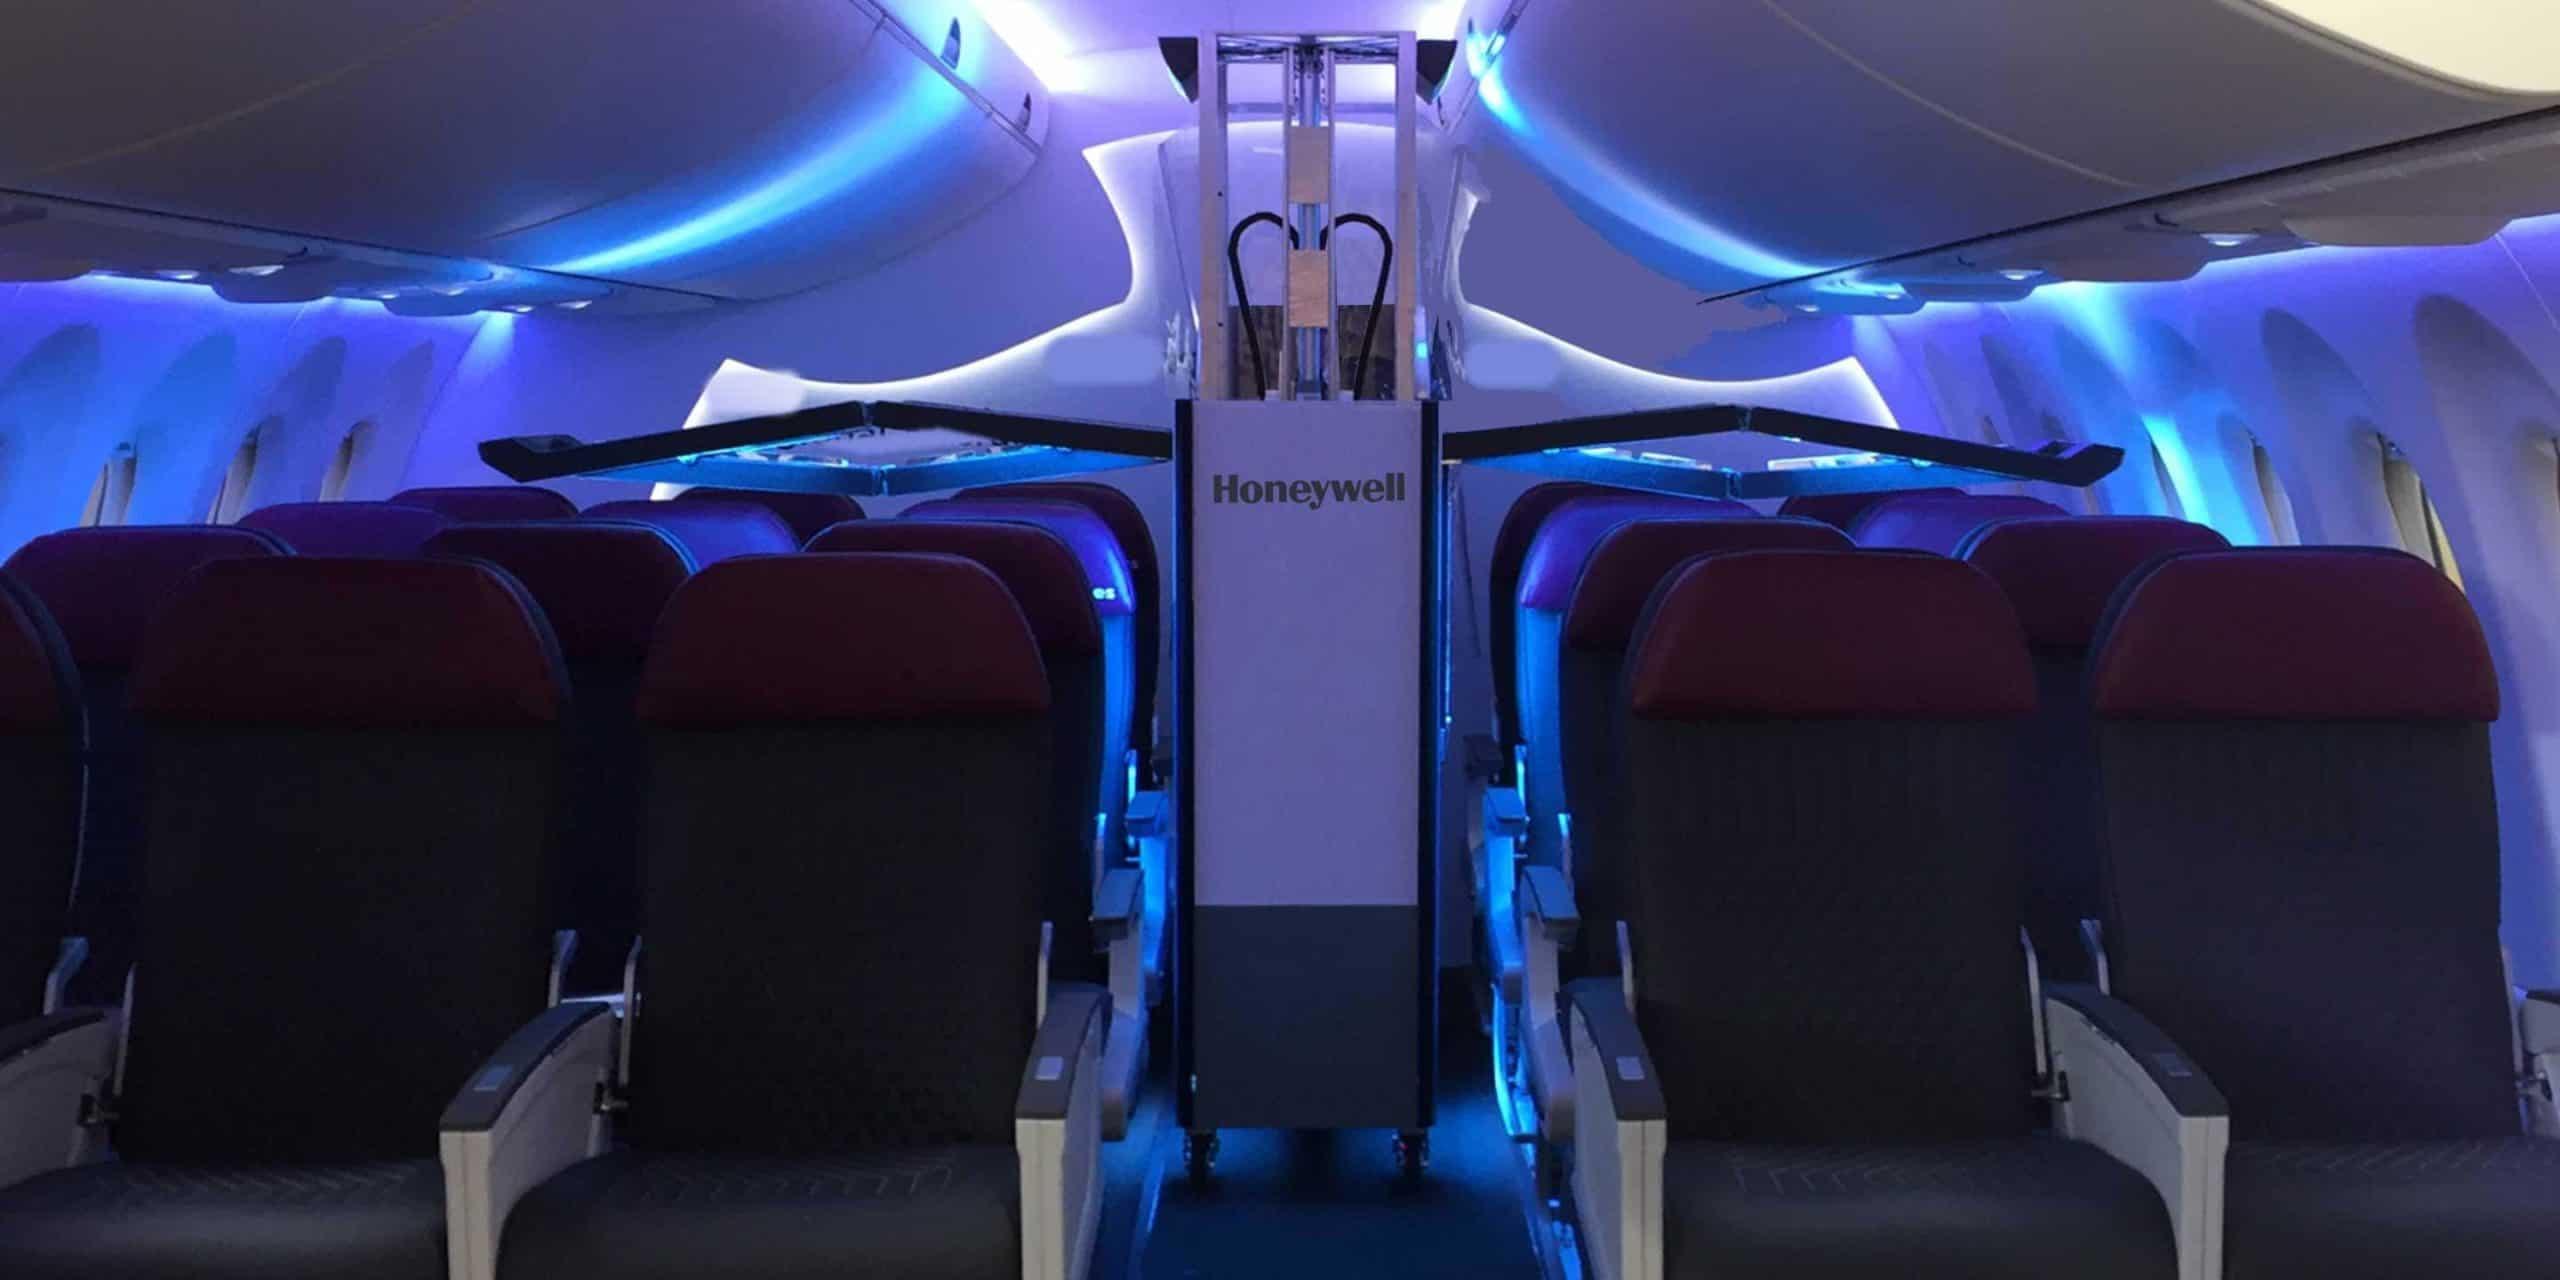 Honeywell_UV_Cabin_System_2880x1440